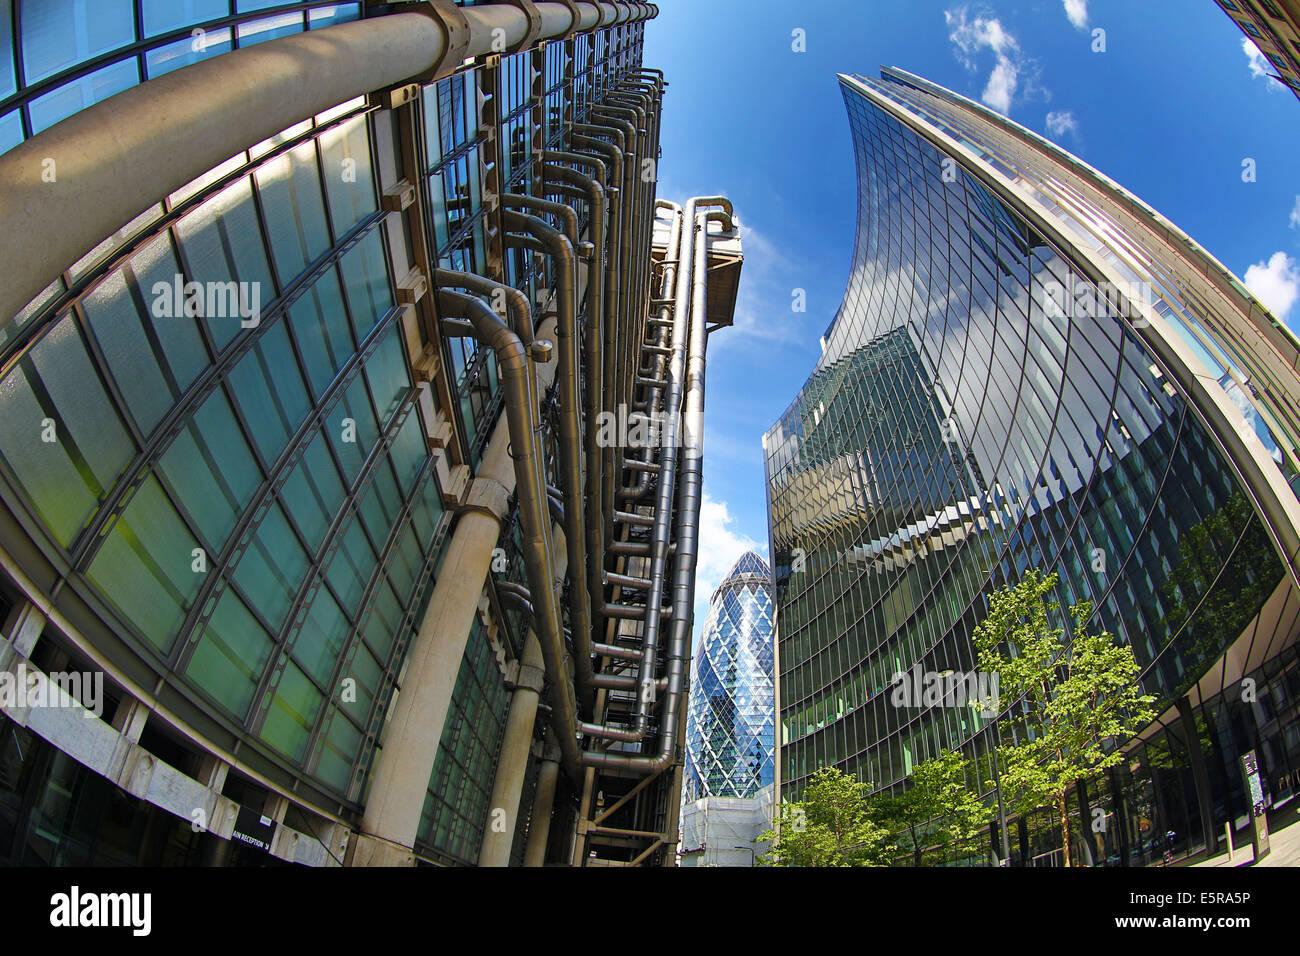 Modern Architecture London England modern architecture of lloyd's of london building, london, england